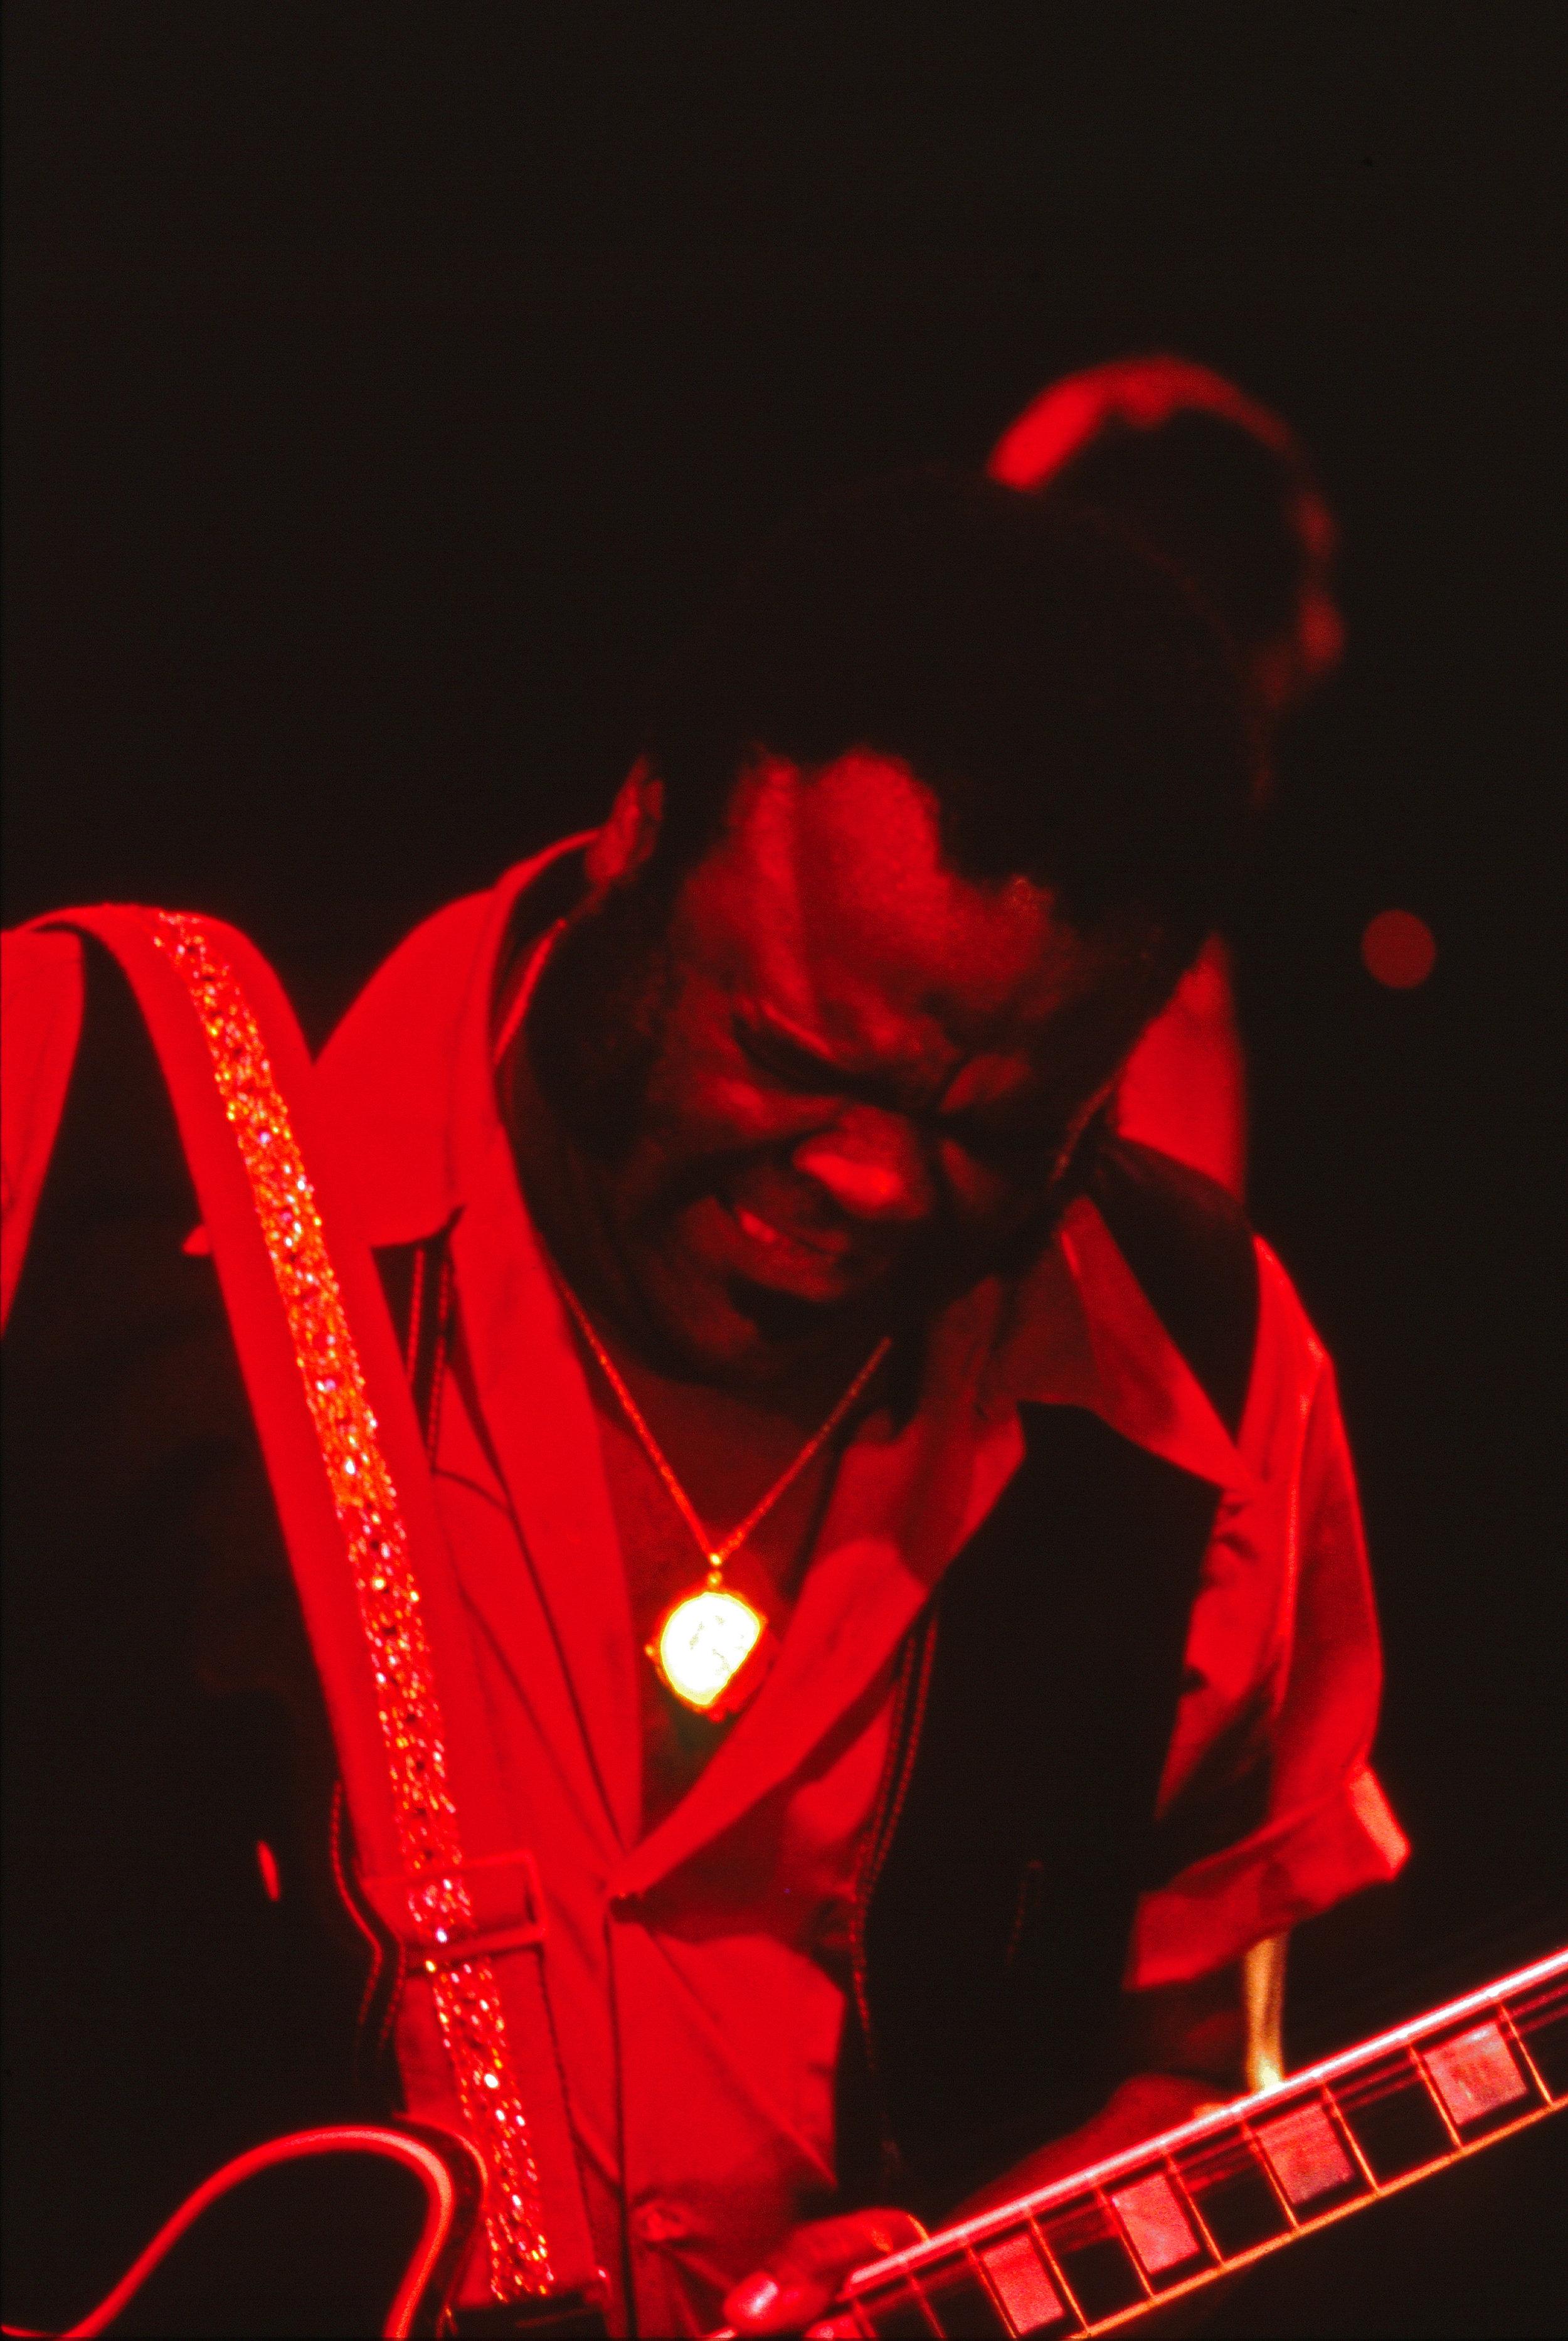 WATT CASEY JR, Dallas Native Freddie King, Buffalo NY 7-6-1976. Color photograph. Courtesy of the artist.